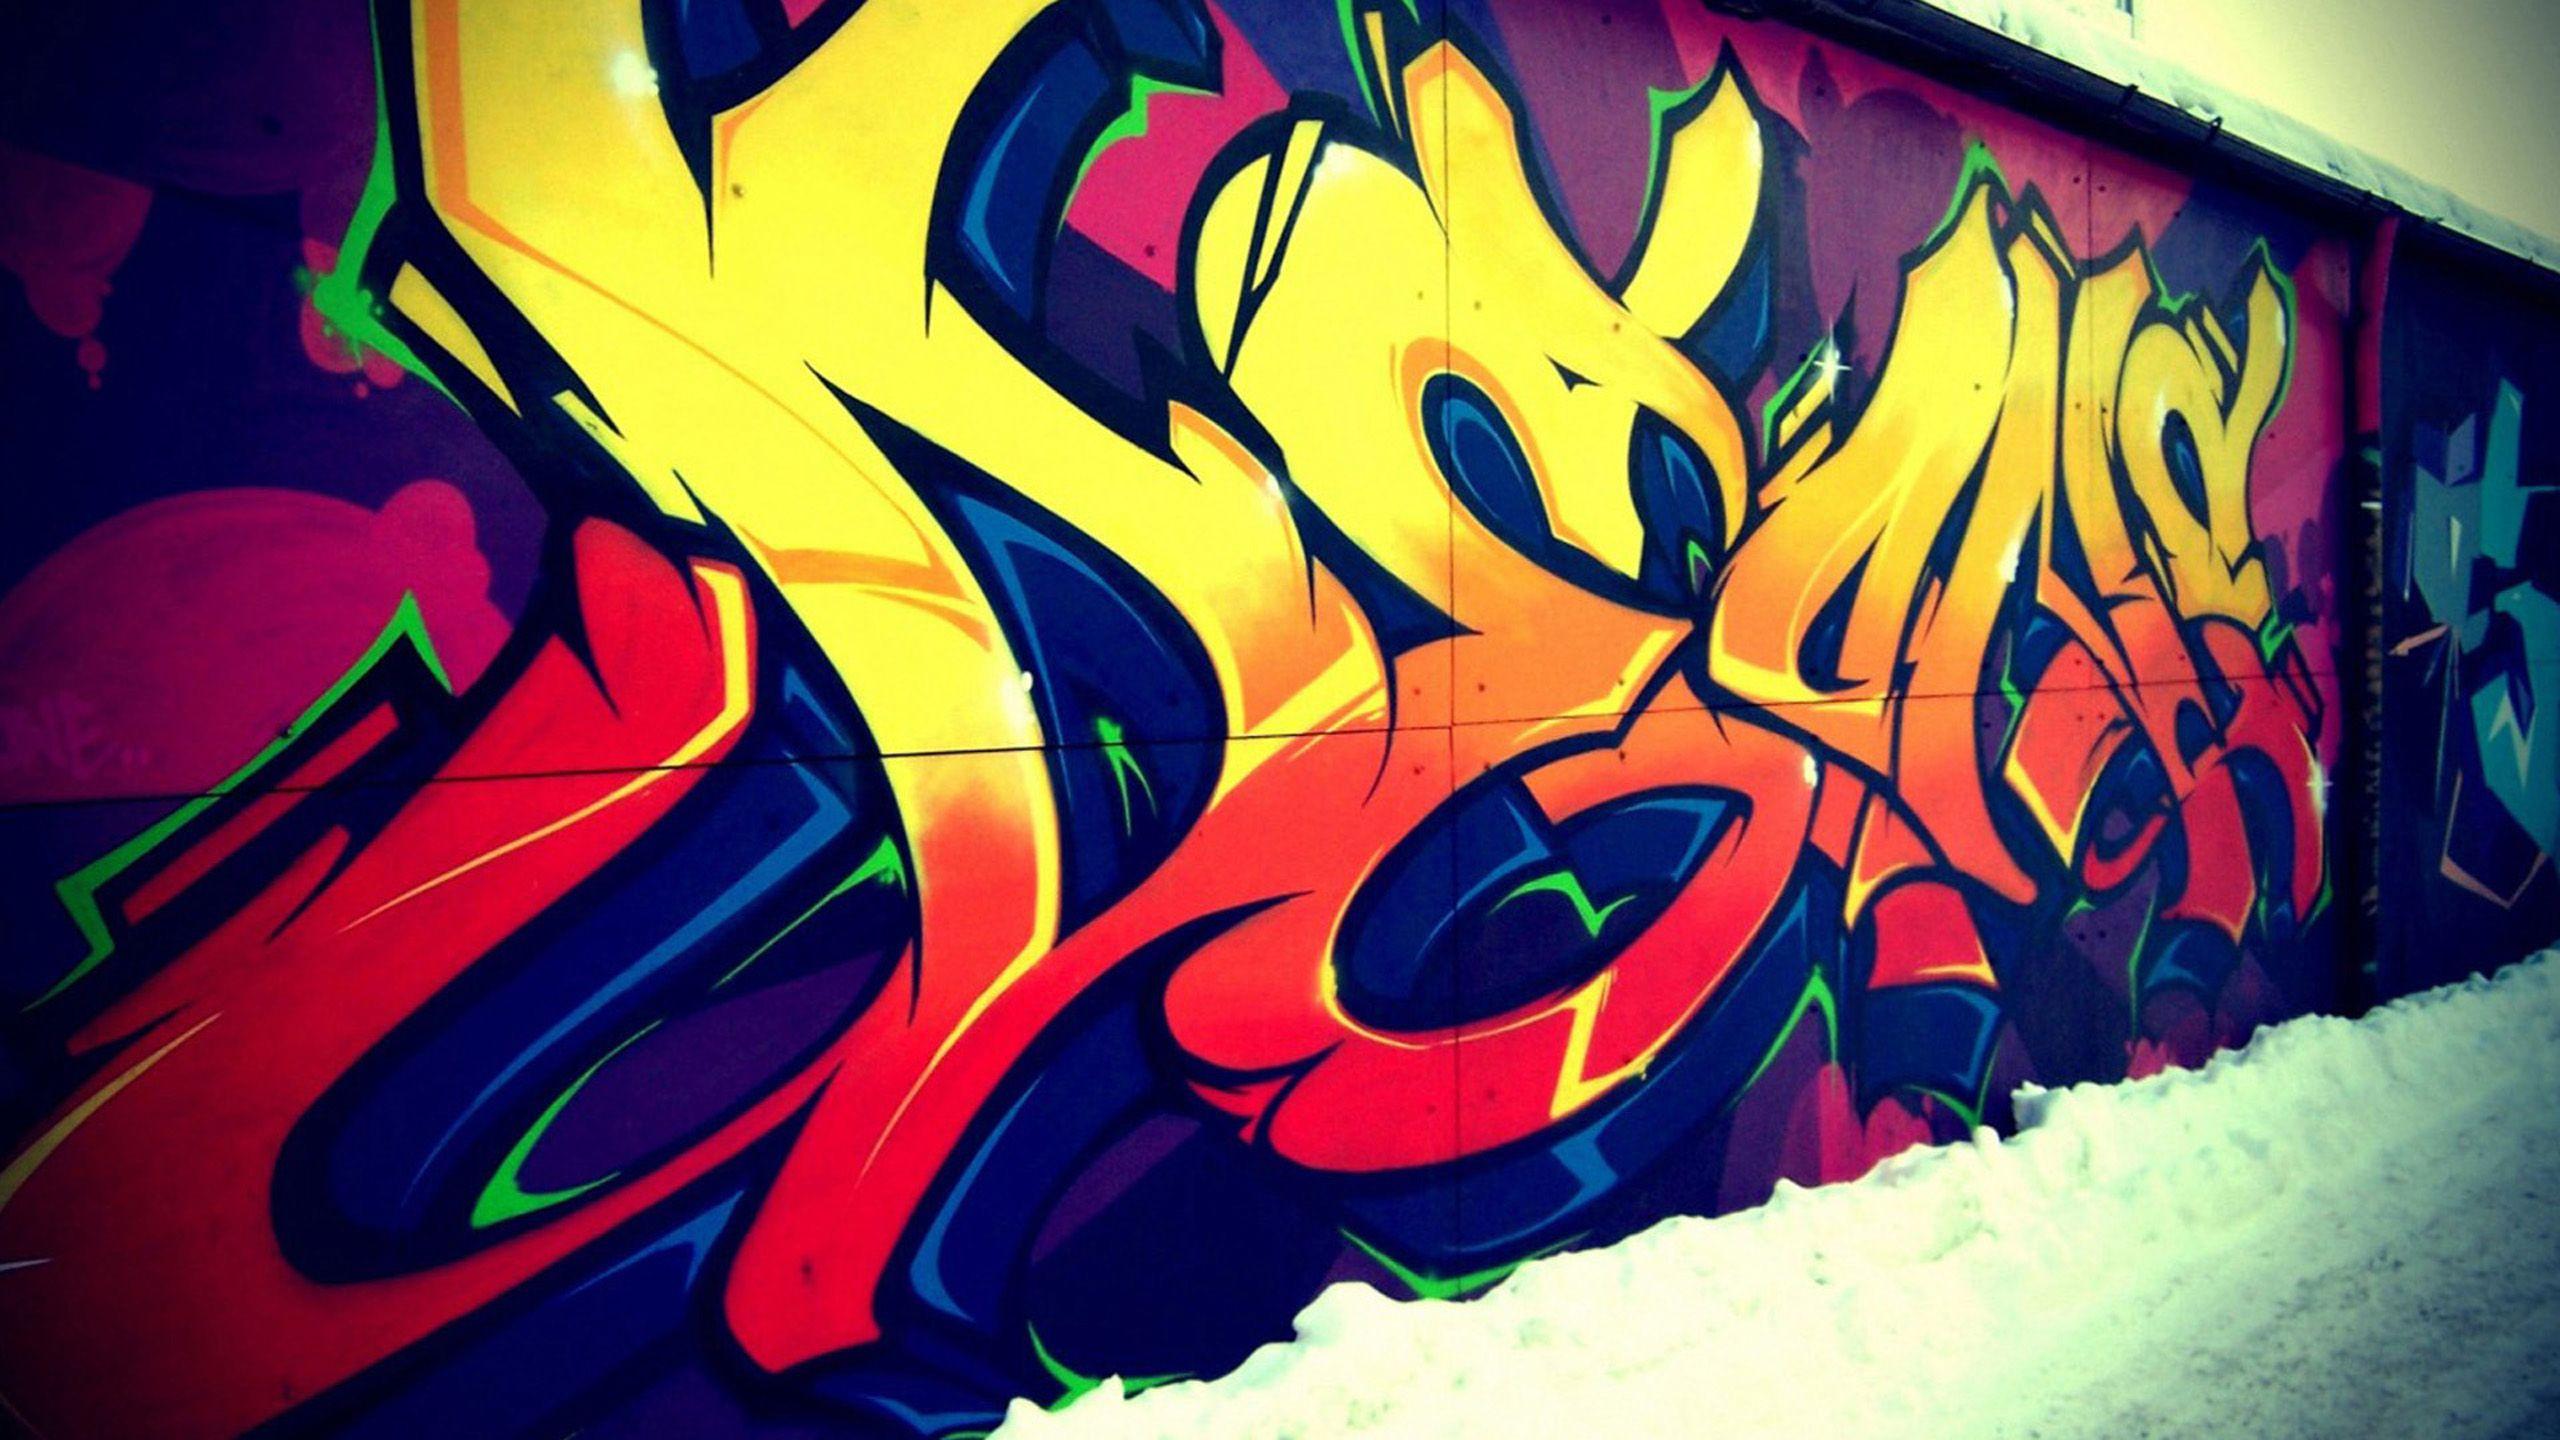 street art wallpaper hd